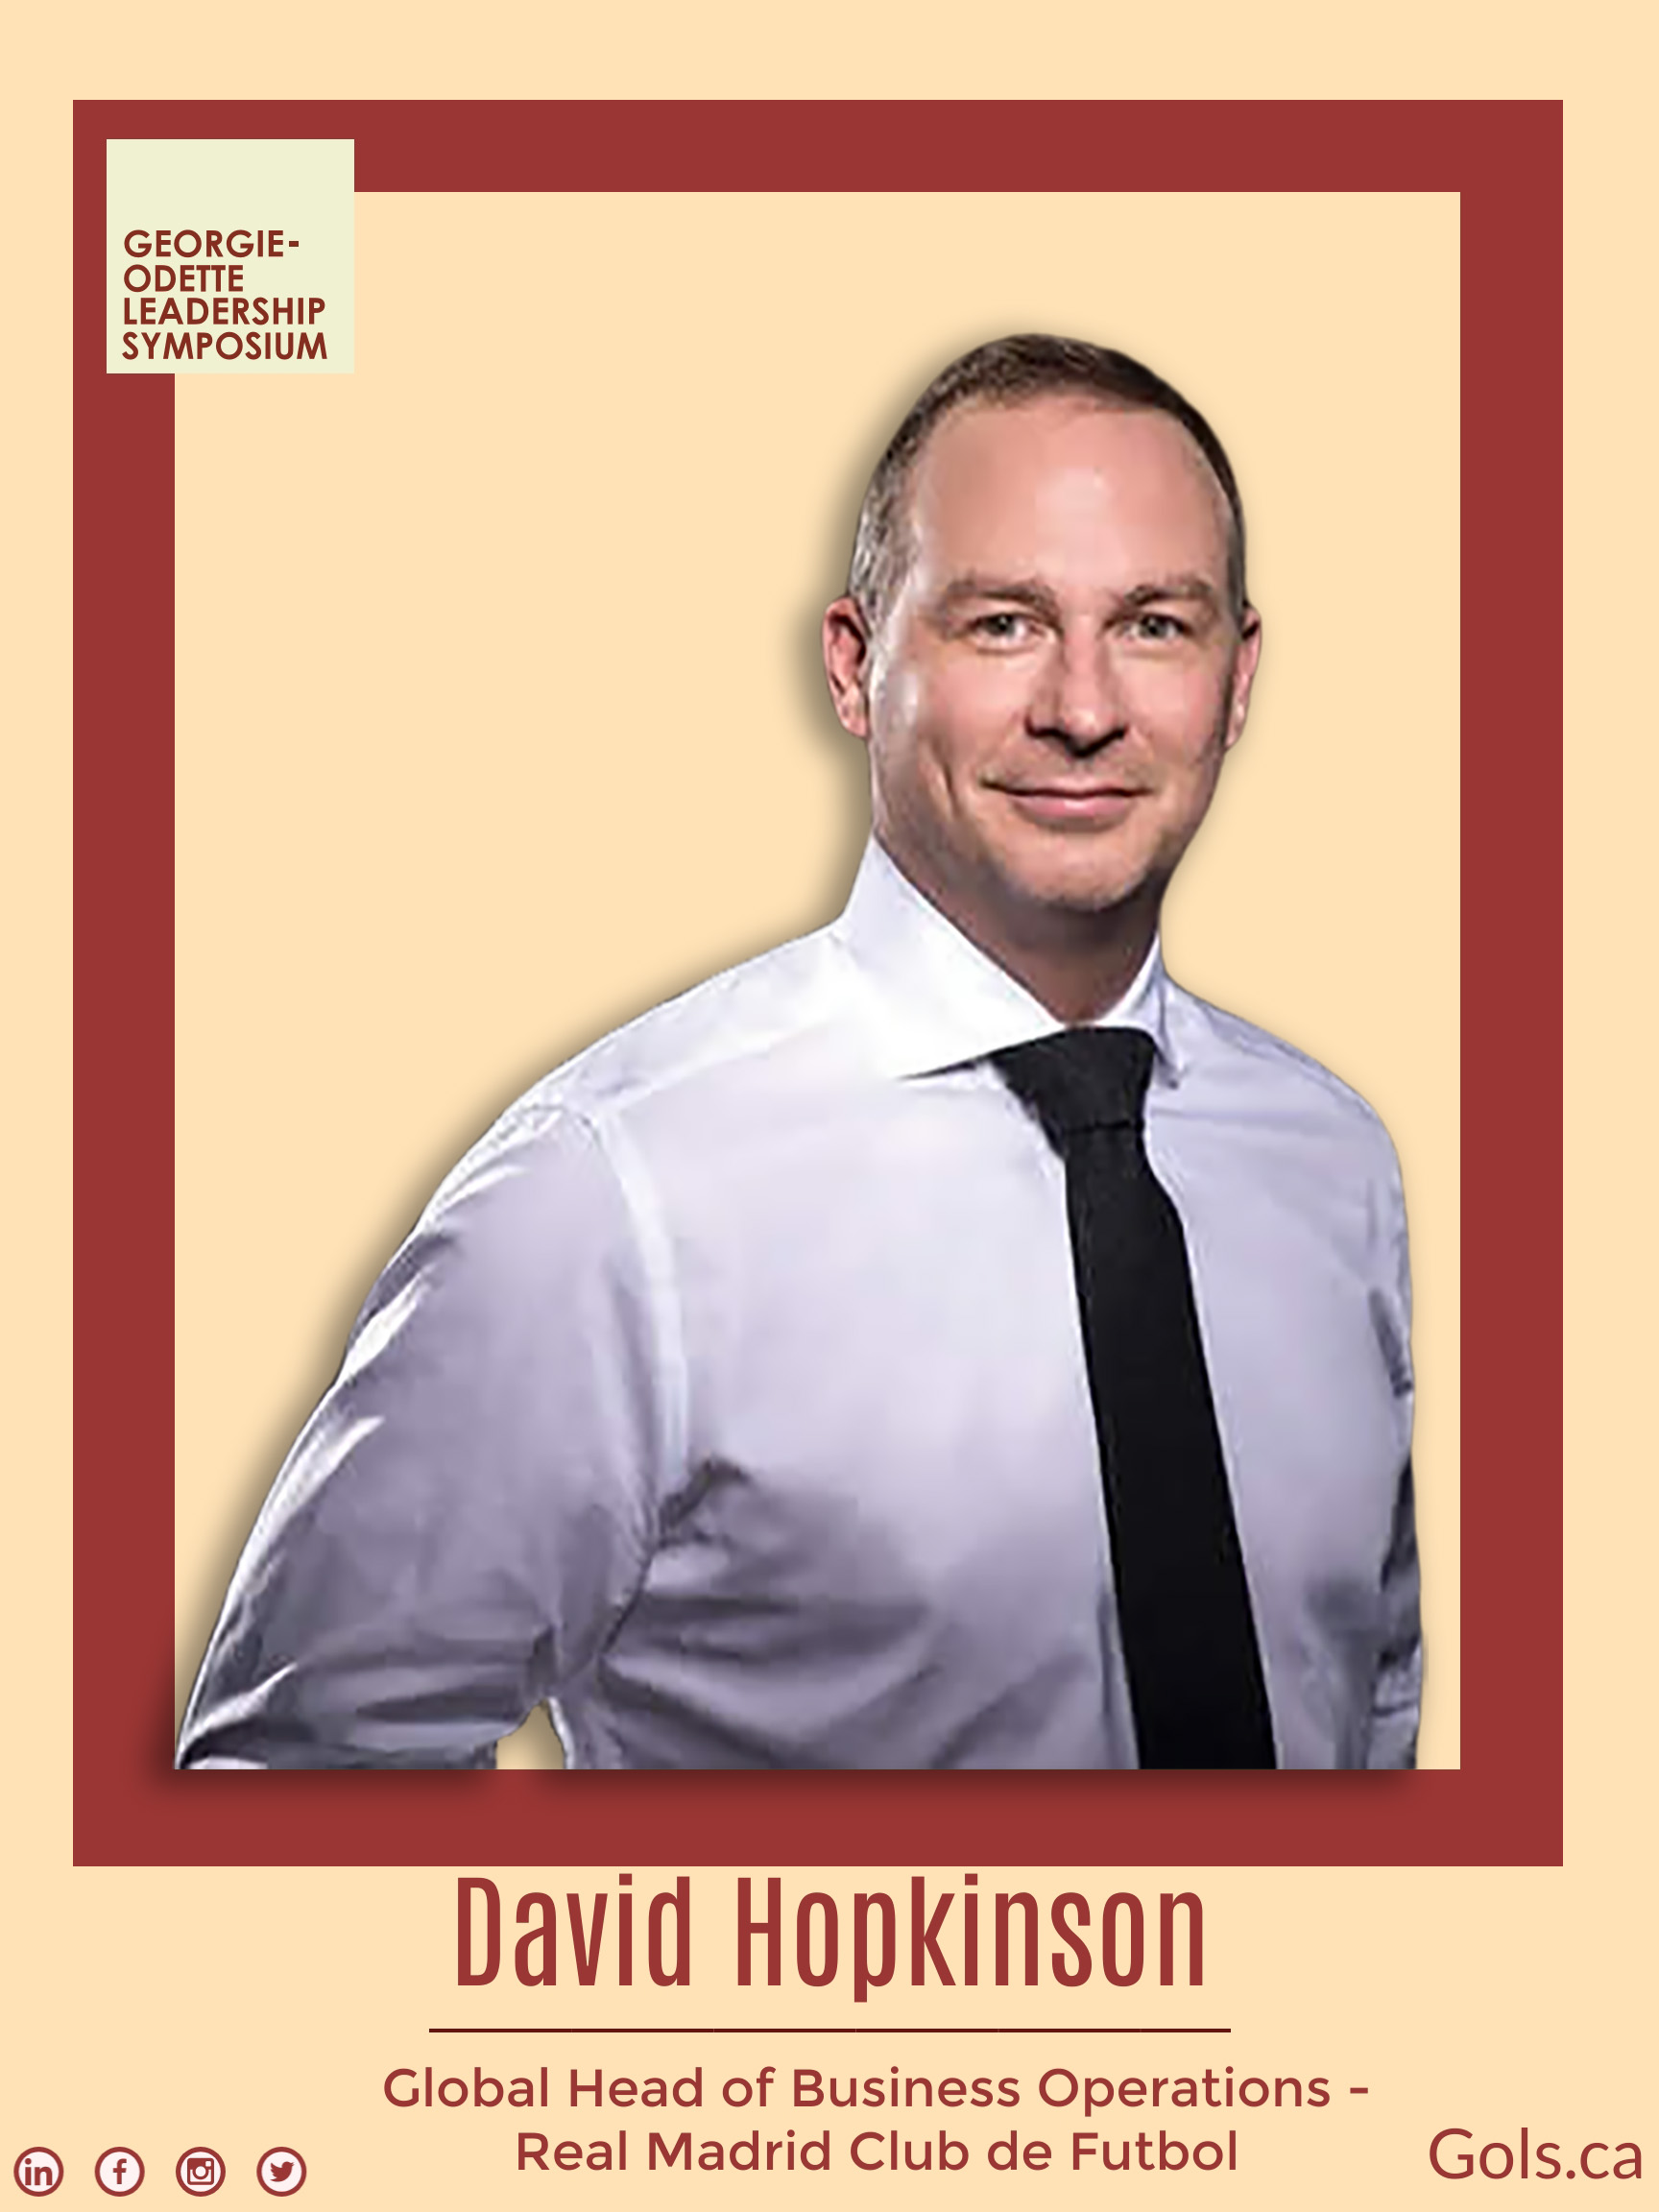 David Hopkinson